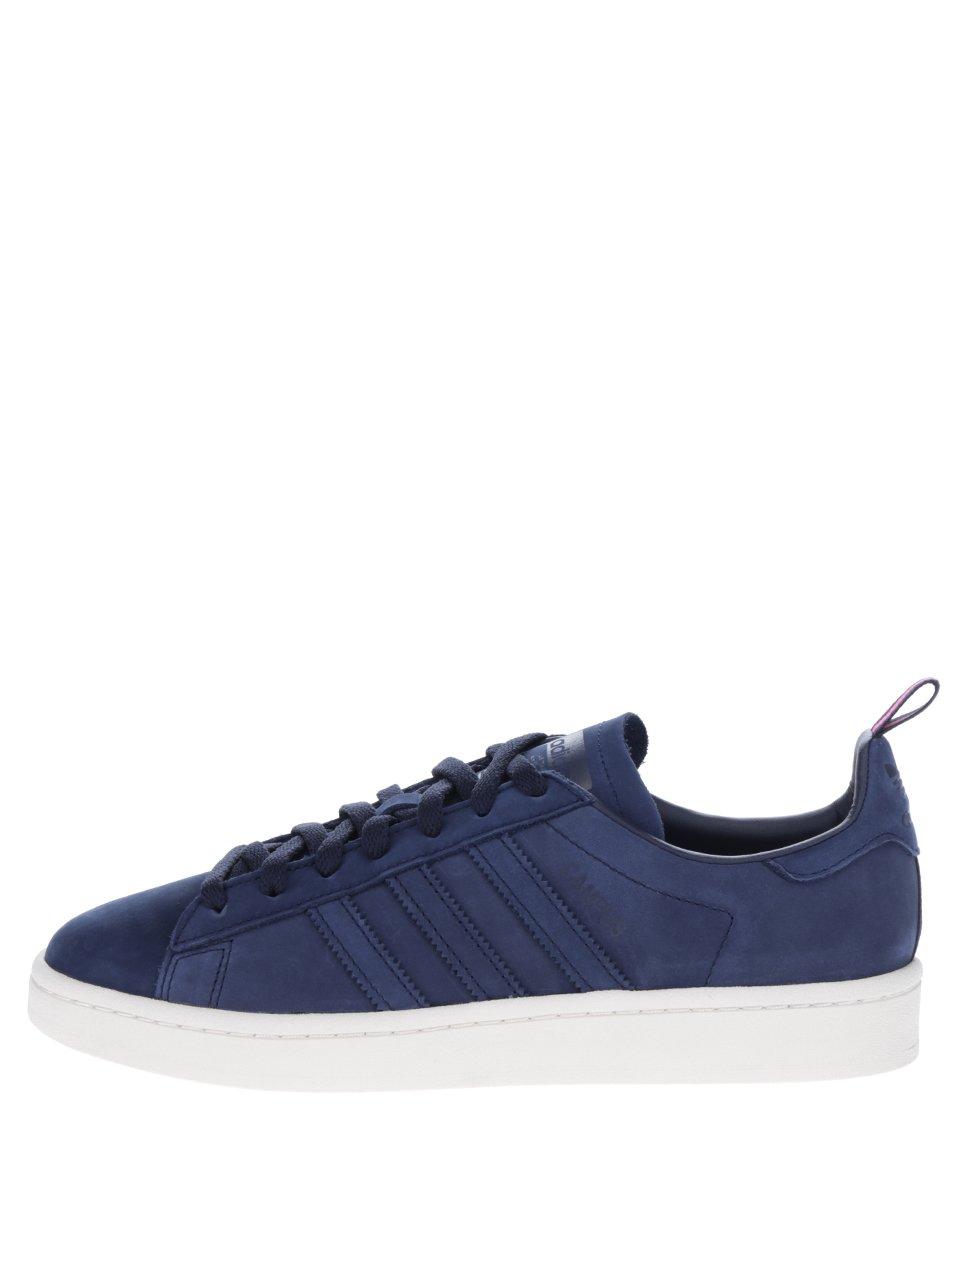 Tmavě modré pánské kožené tenisky adidas Originals Campus 13b8e1fcb9